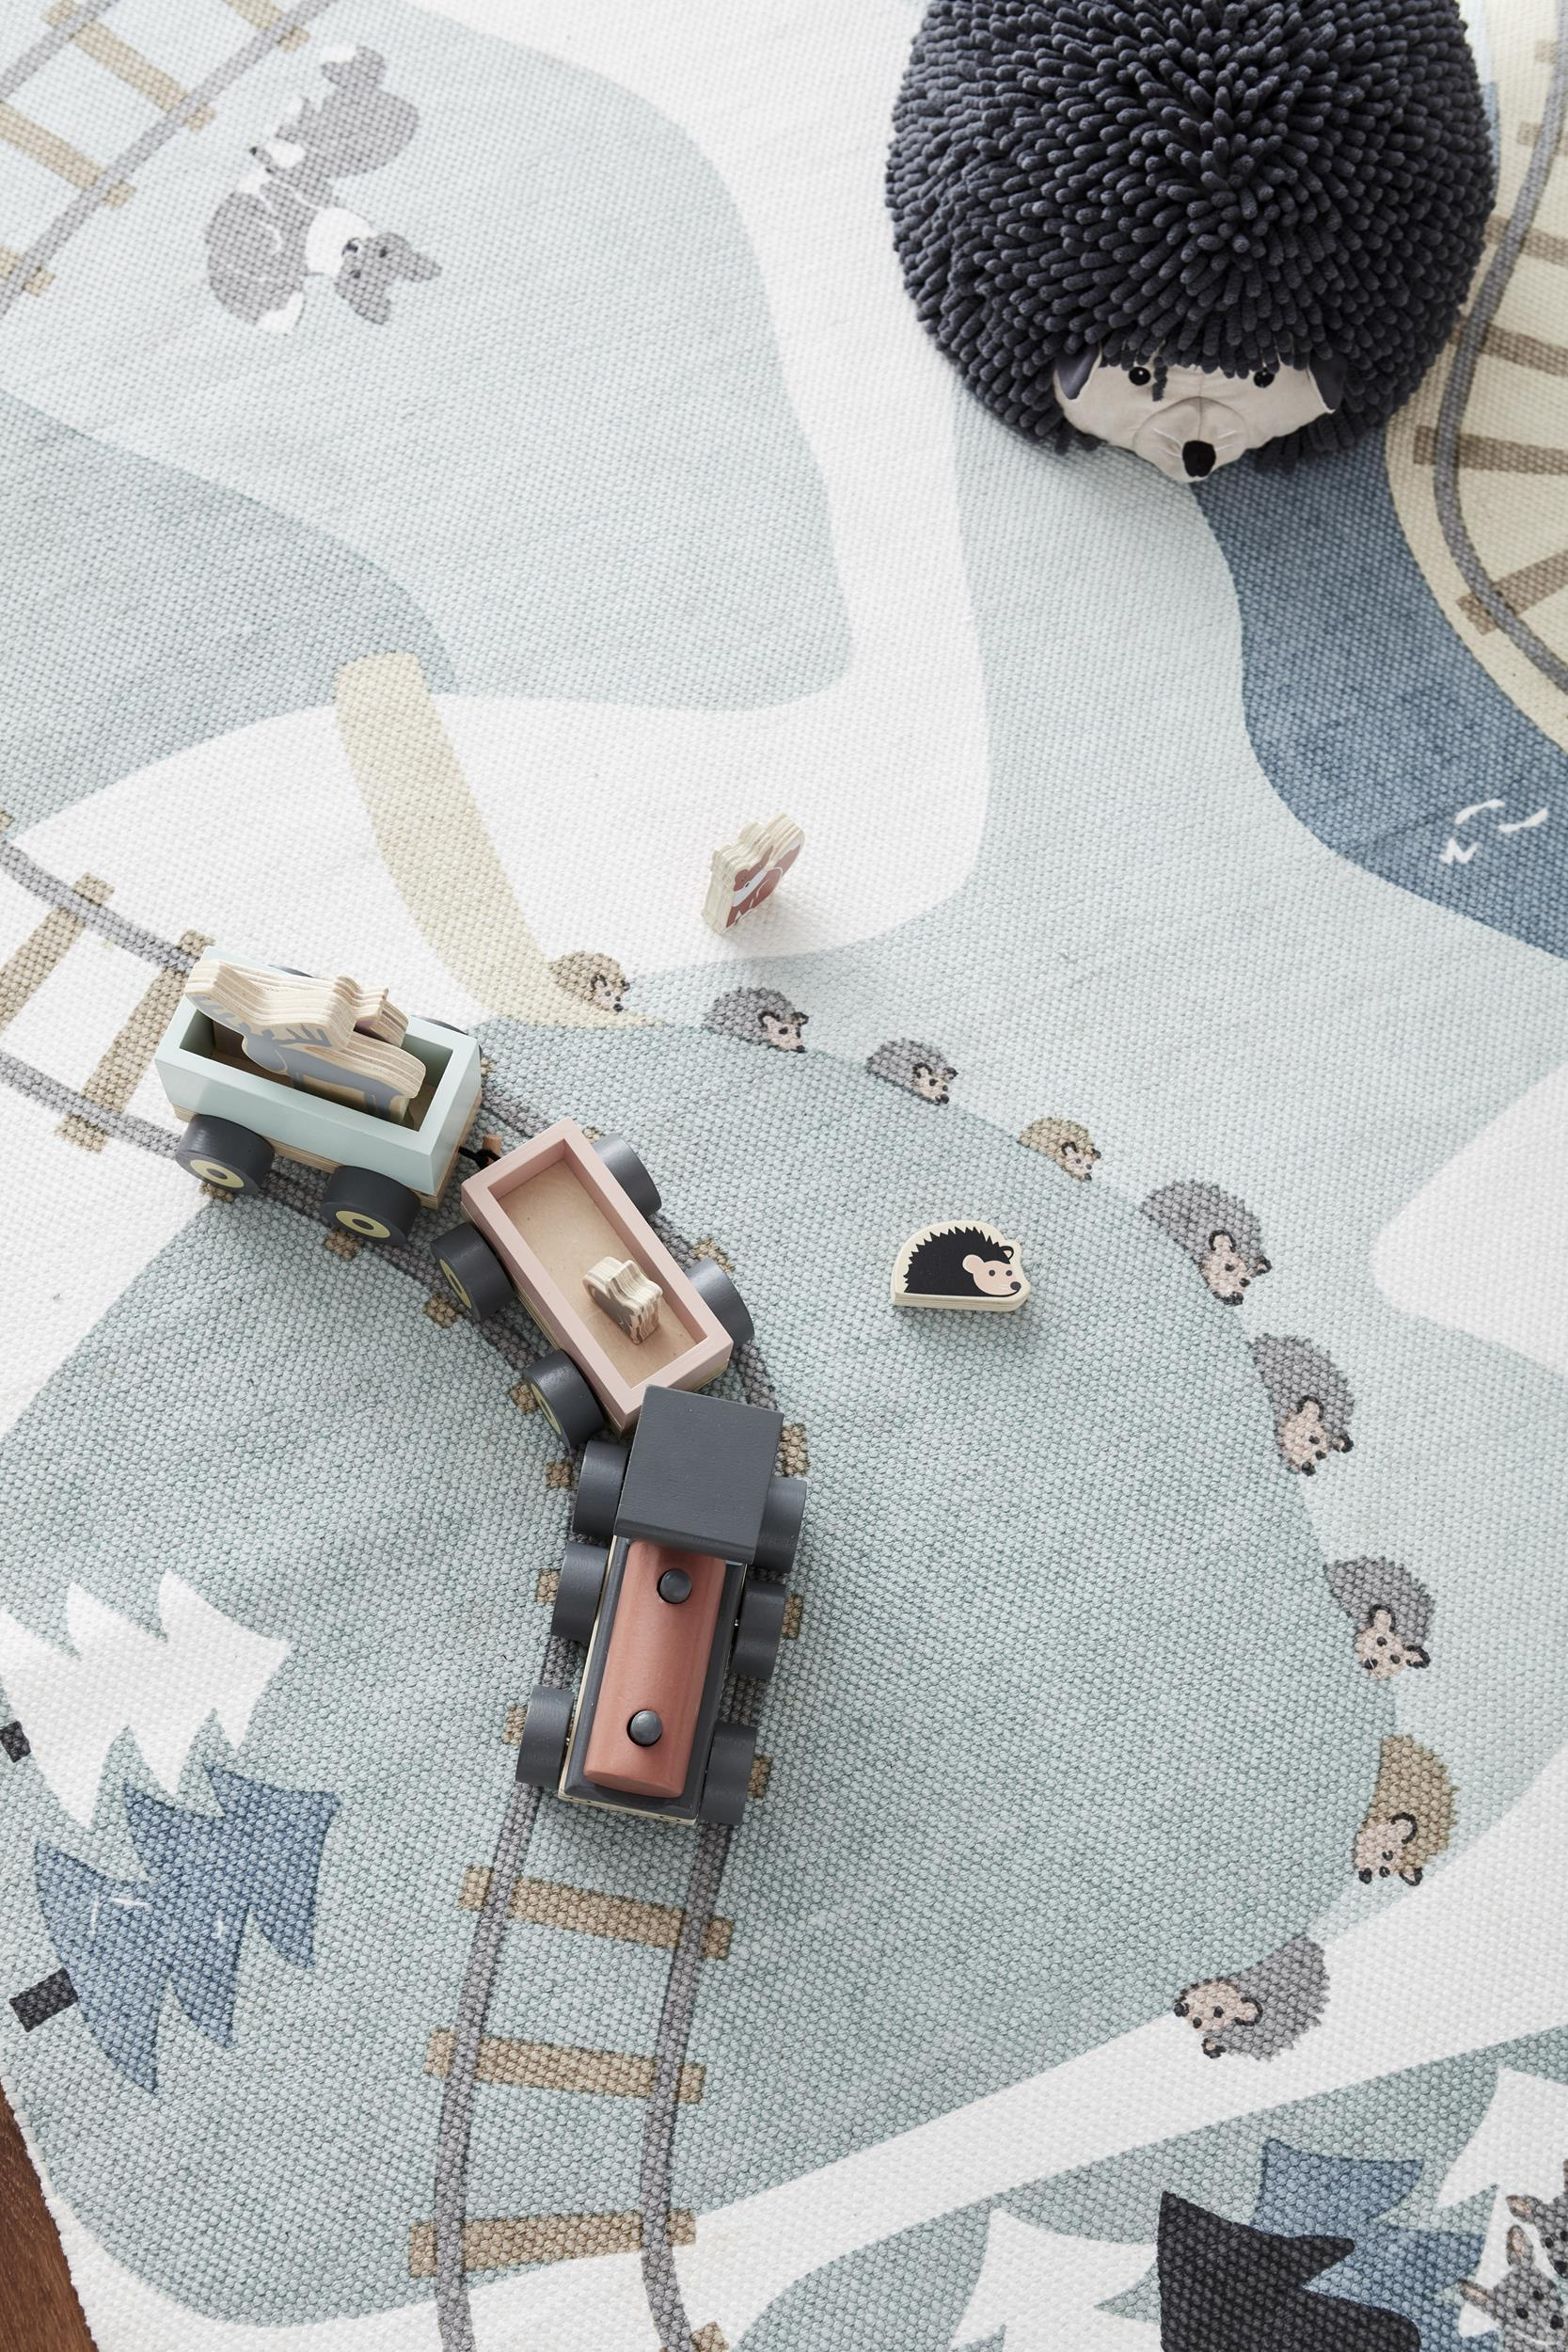 Kids Concept Edvin Hedgehog Seat Pouf Toy